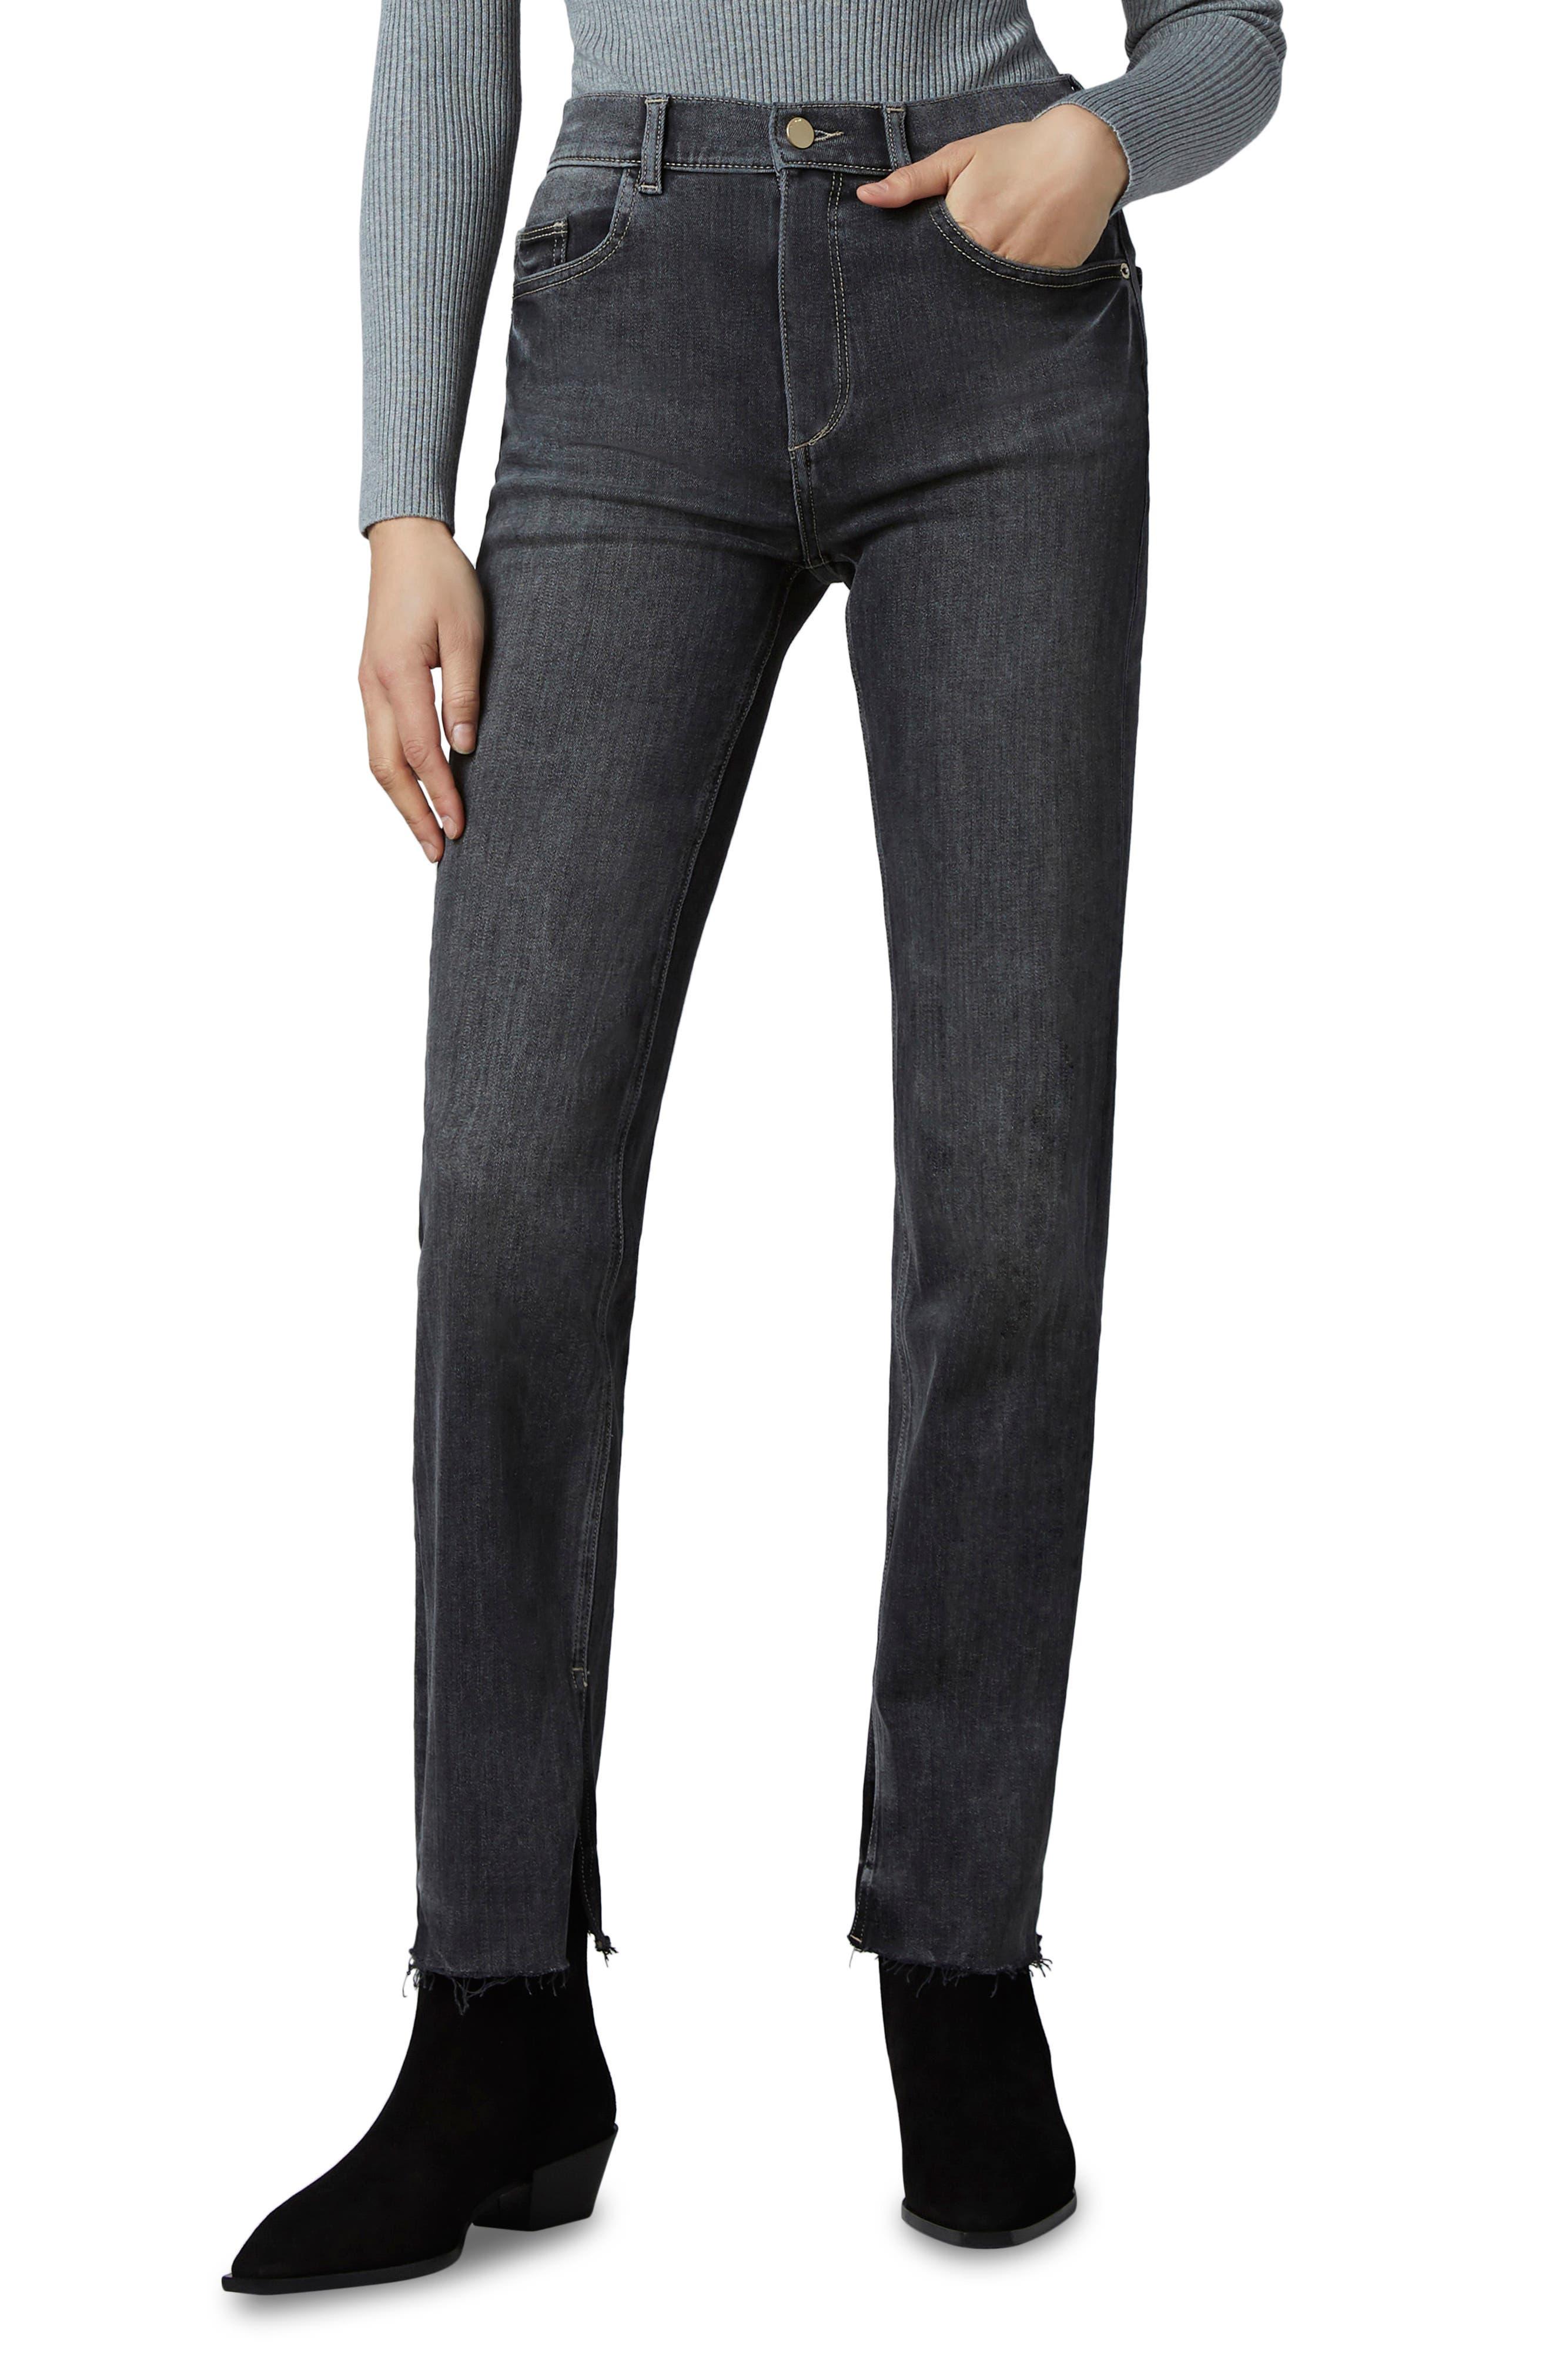 1961 Patti High Waist Straight Leg Jeans